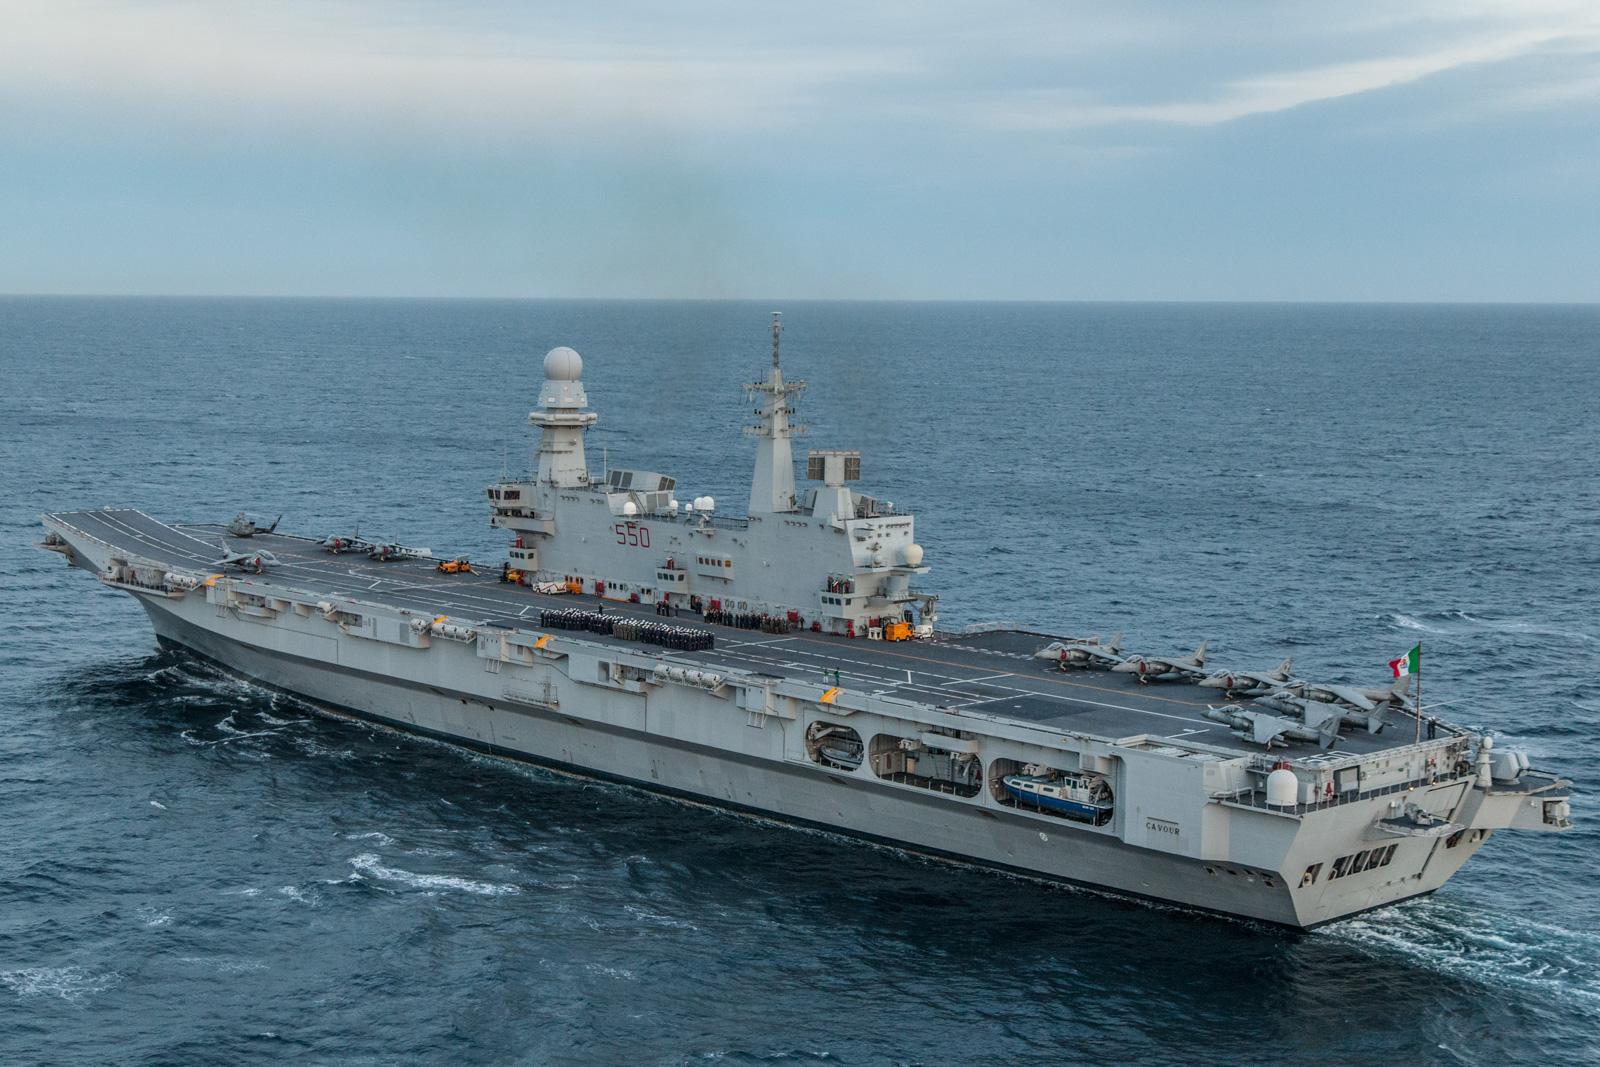 La portaerei Cavour. Lammiraglia italiana